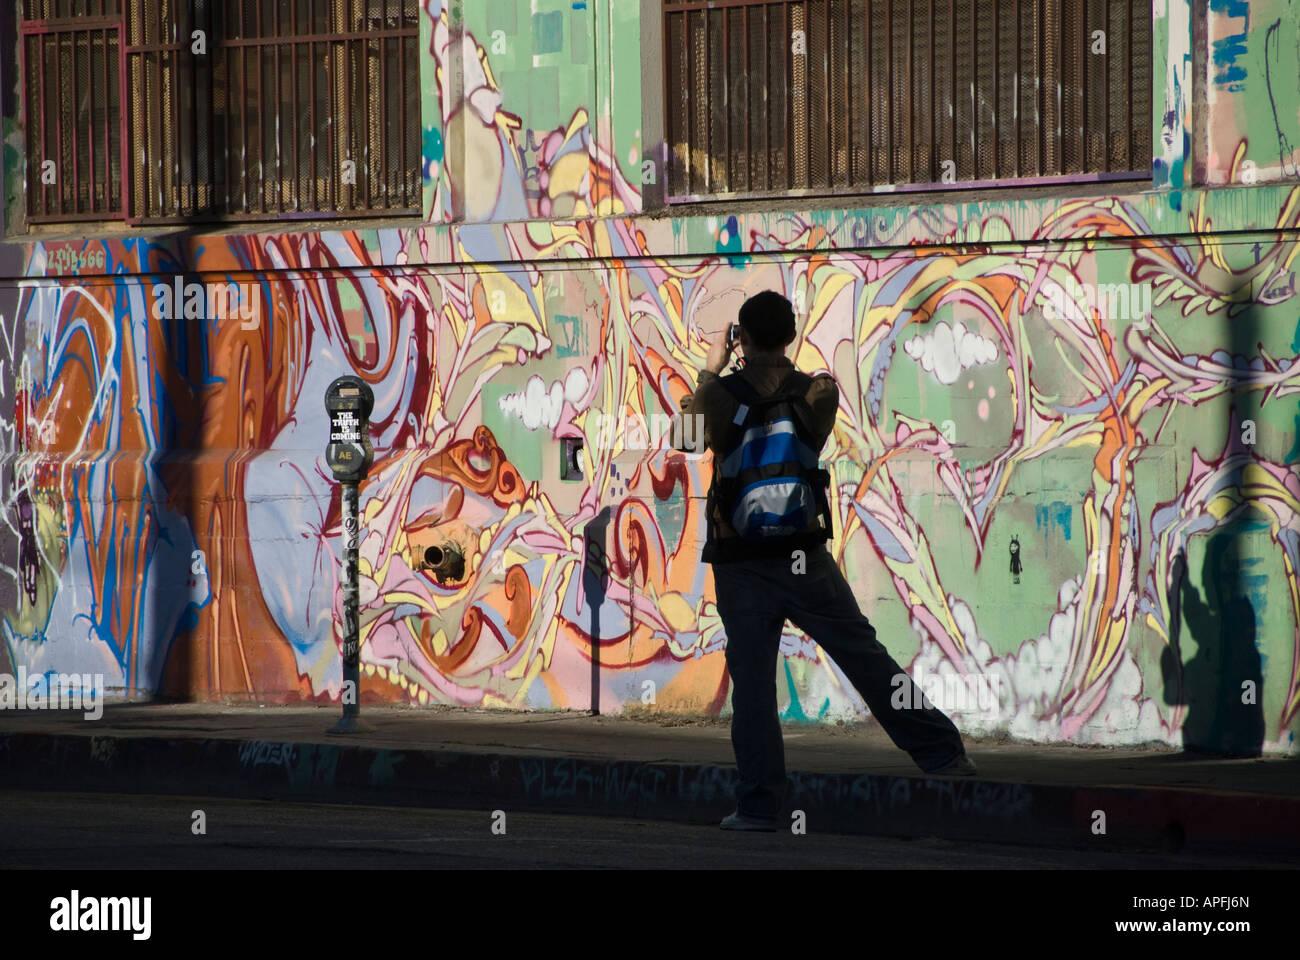 Graffiti wall tokyo - Stock Photo Visitor Photographs Wall Graffiti Near Rose St Little Tokyo District Los Angeles California